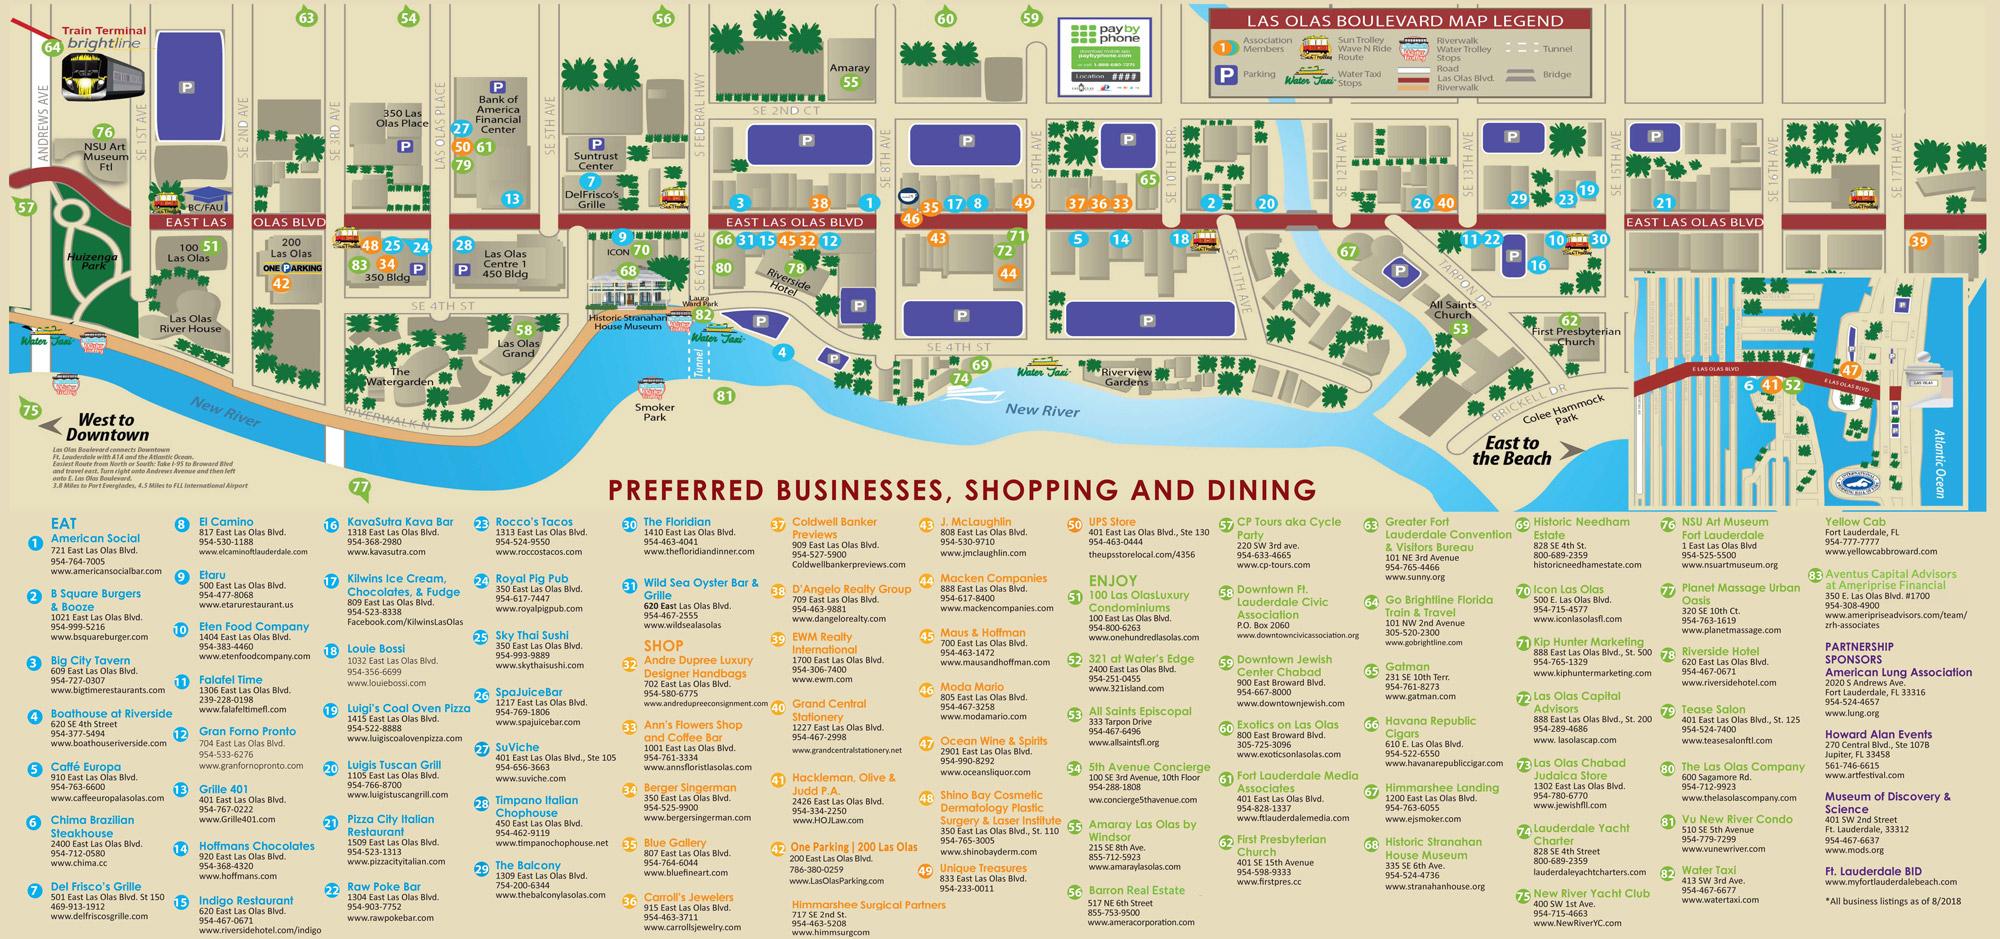 Las Olas Boulevard Fort Lauderdale   Restaurants, Shops & Things To Do - Street Map Of Fort Lauderdale Florida